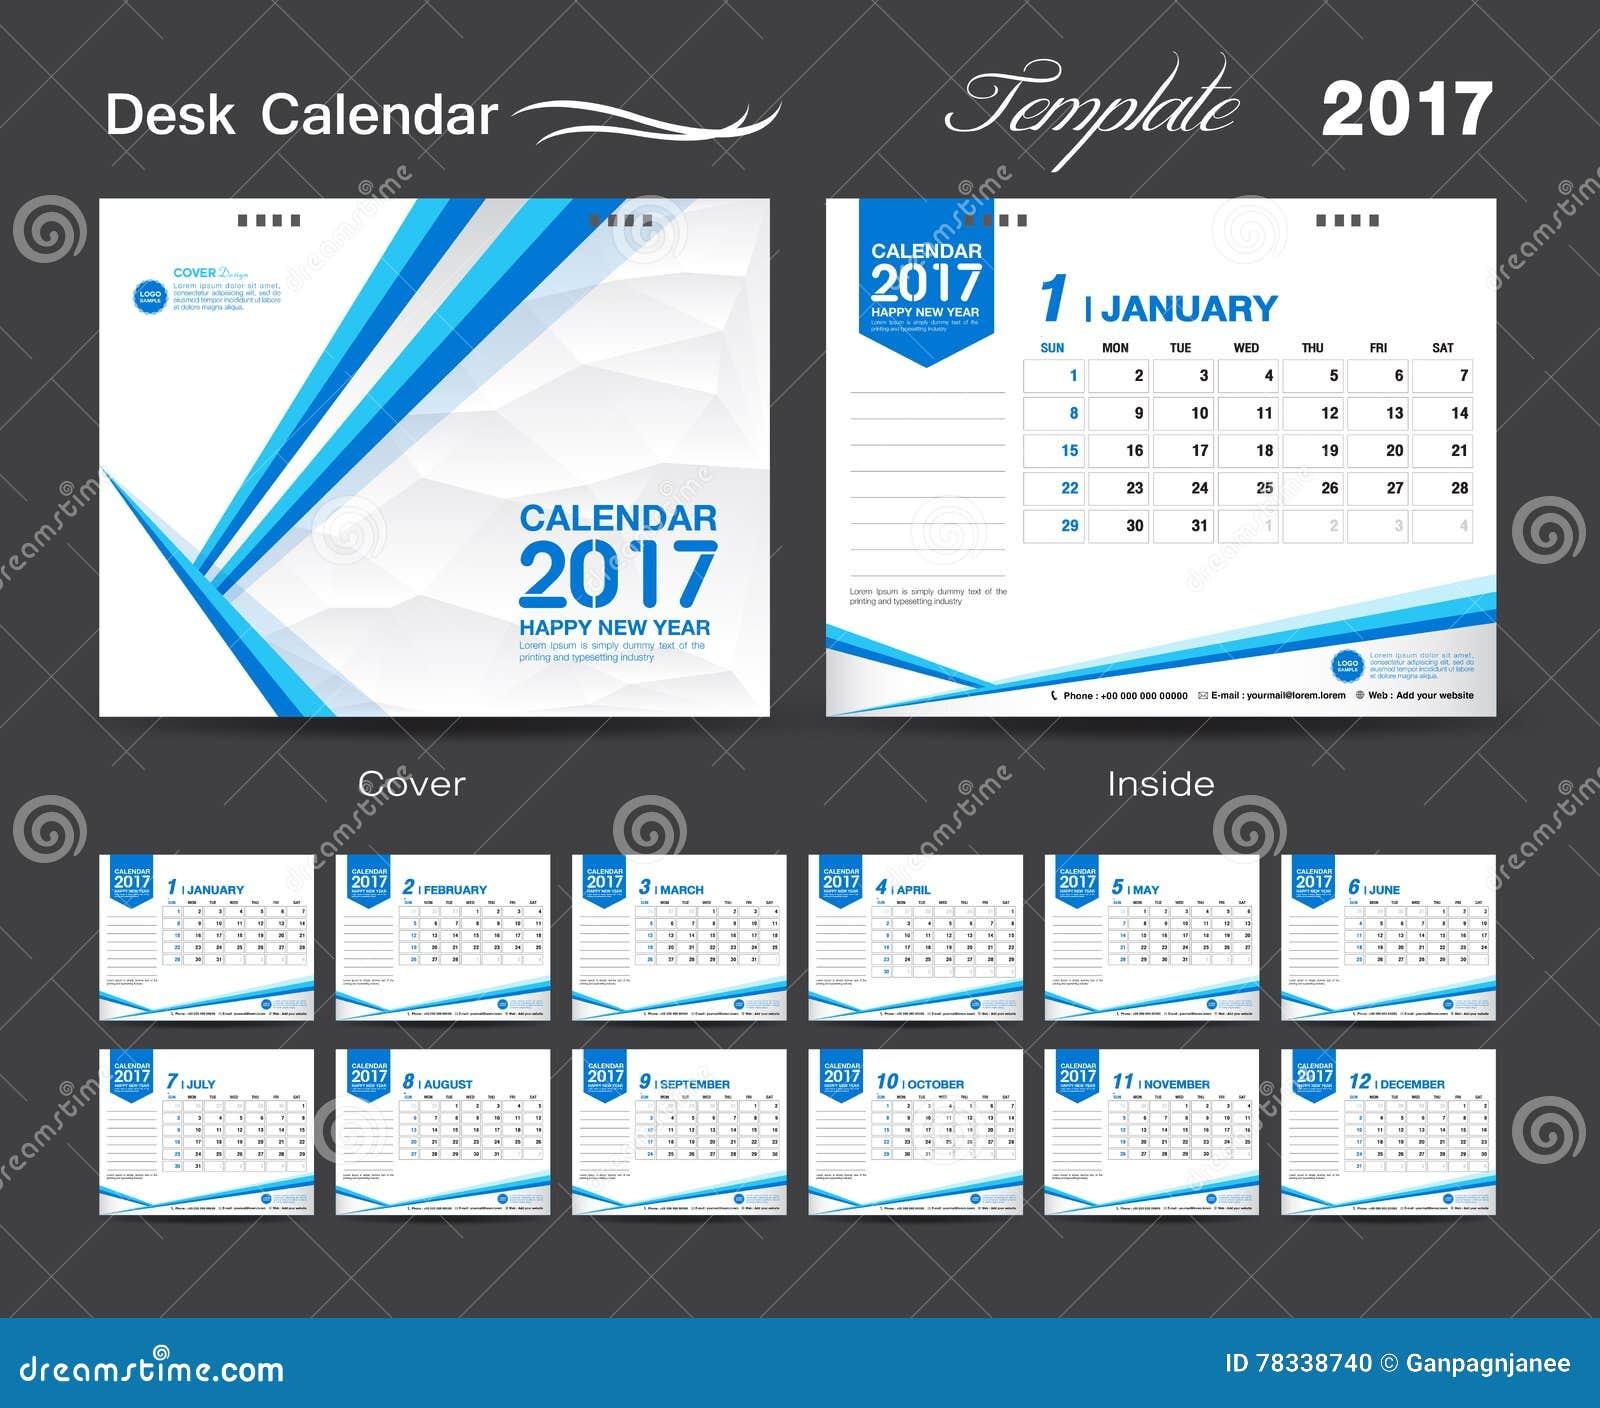 Создание календаря с i